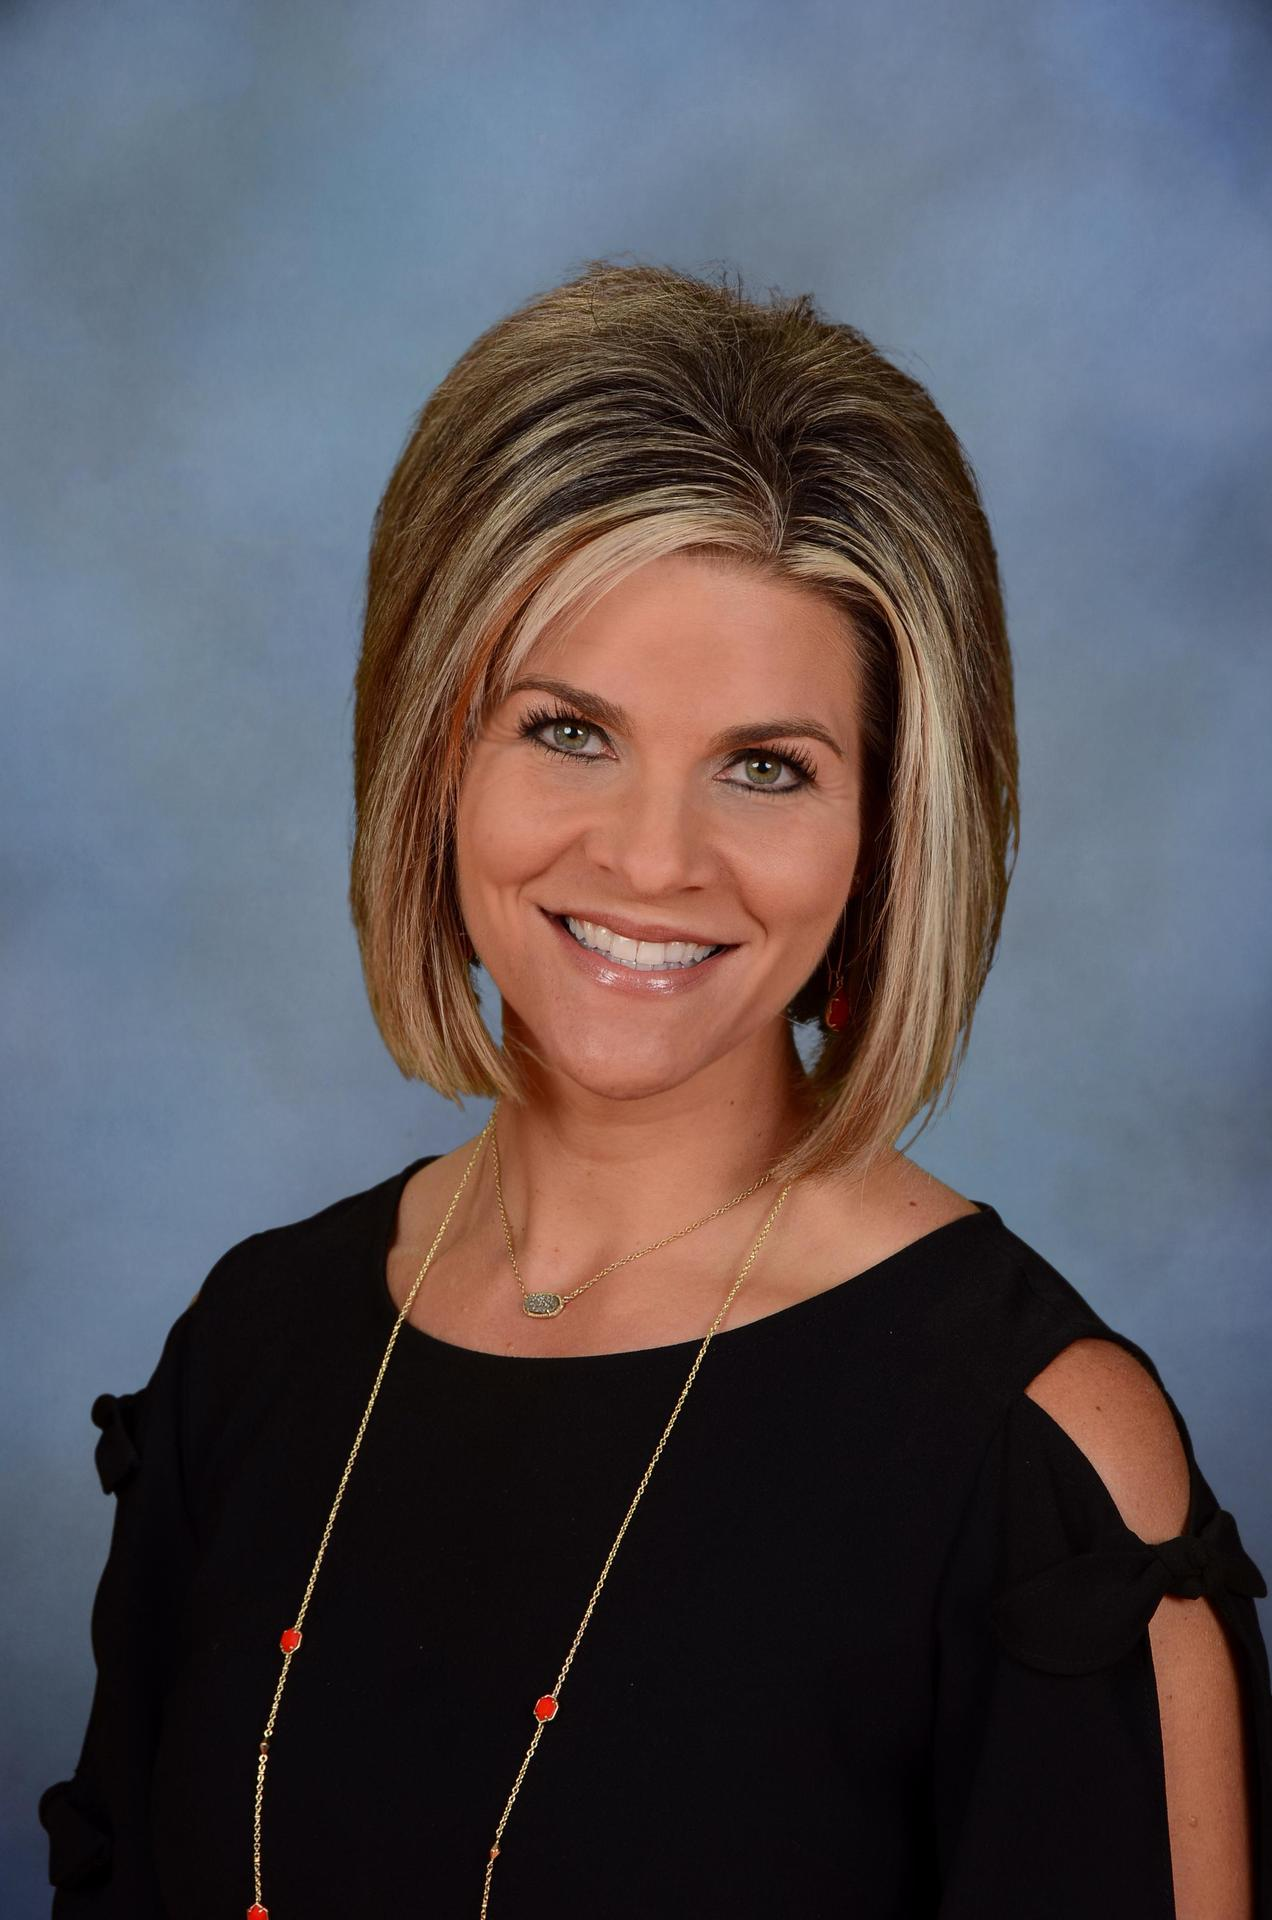 Jennifer Schultz, Principal